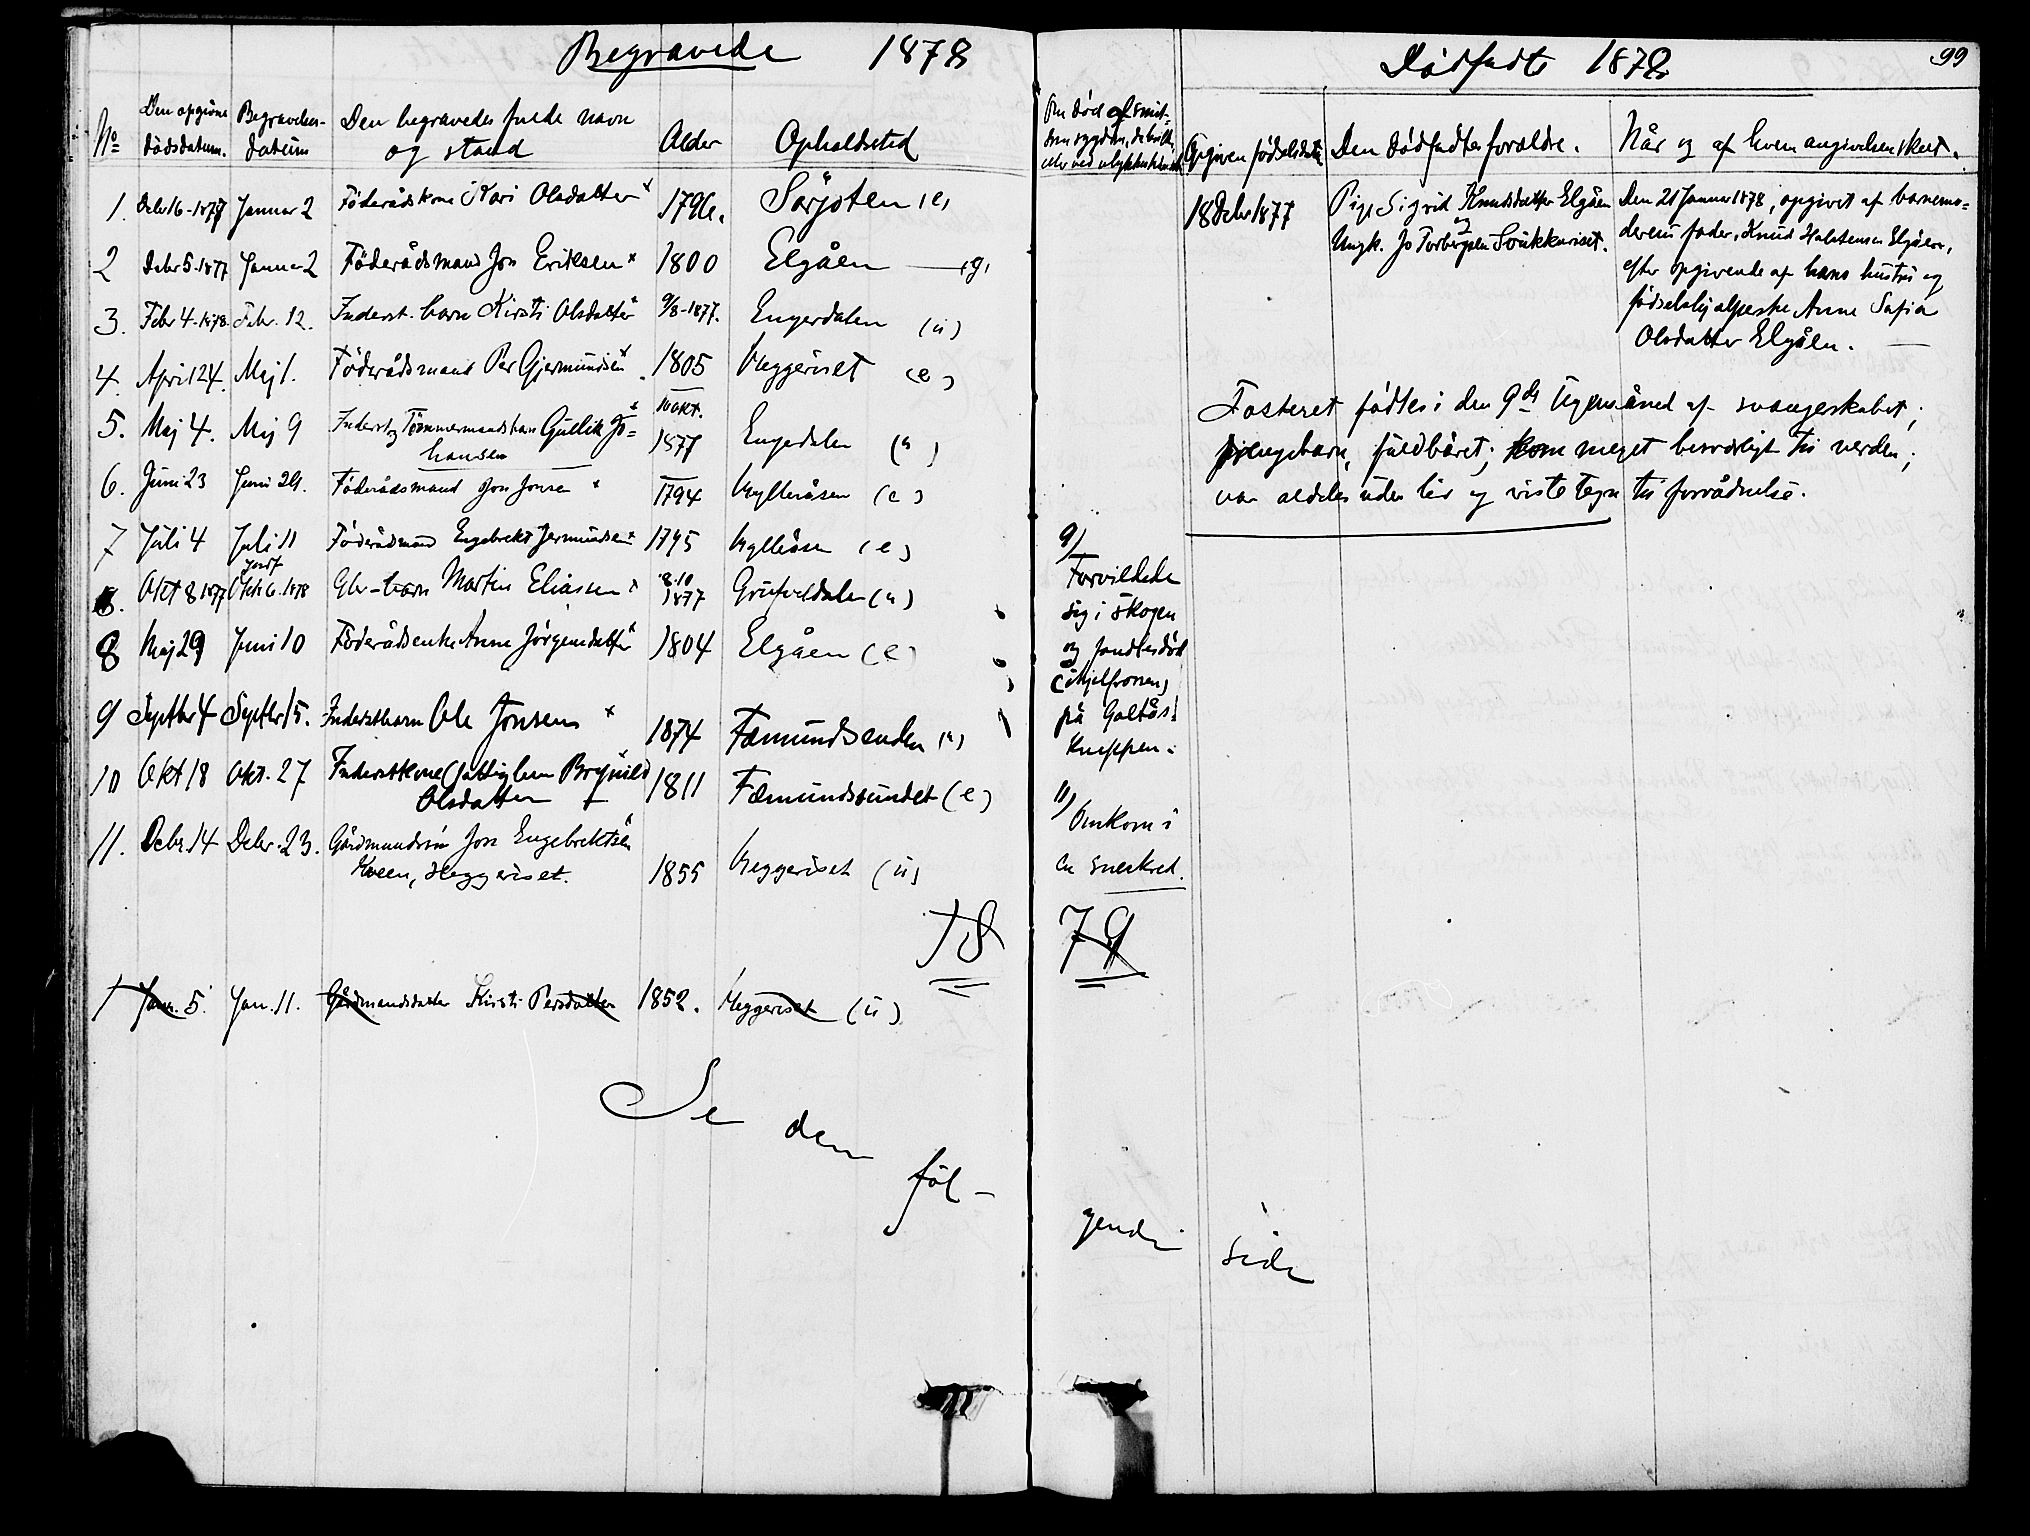 SAH, Rendalen prestekontor, H/Ha/Hab/L0002: Parish register (copy) no. 2, 1858-1880, p. 99